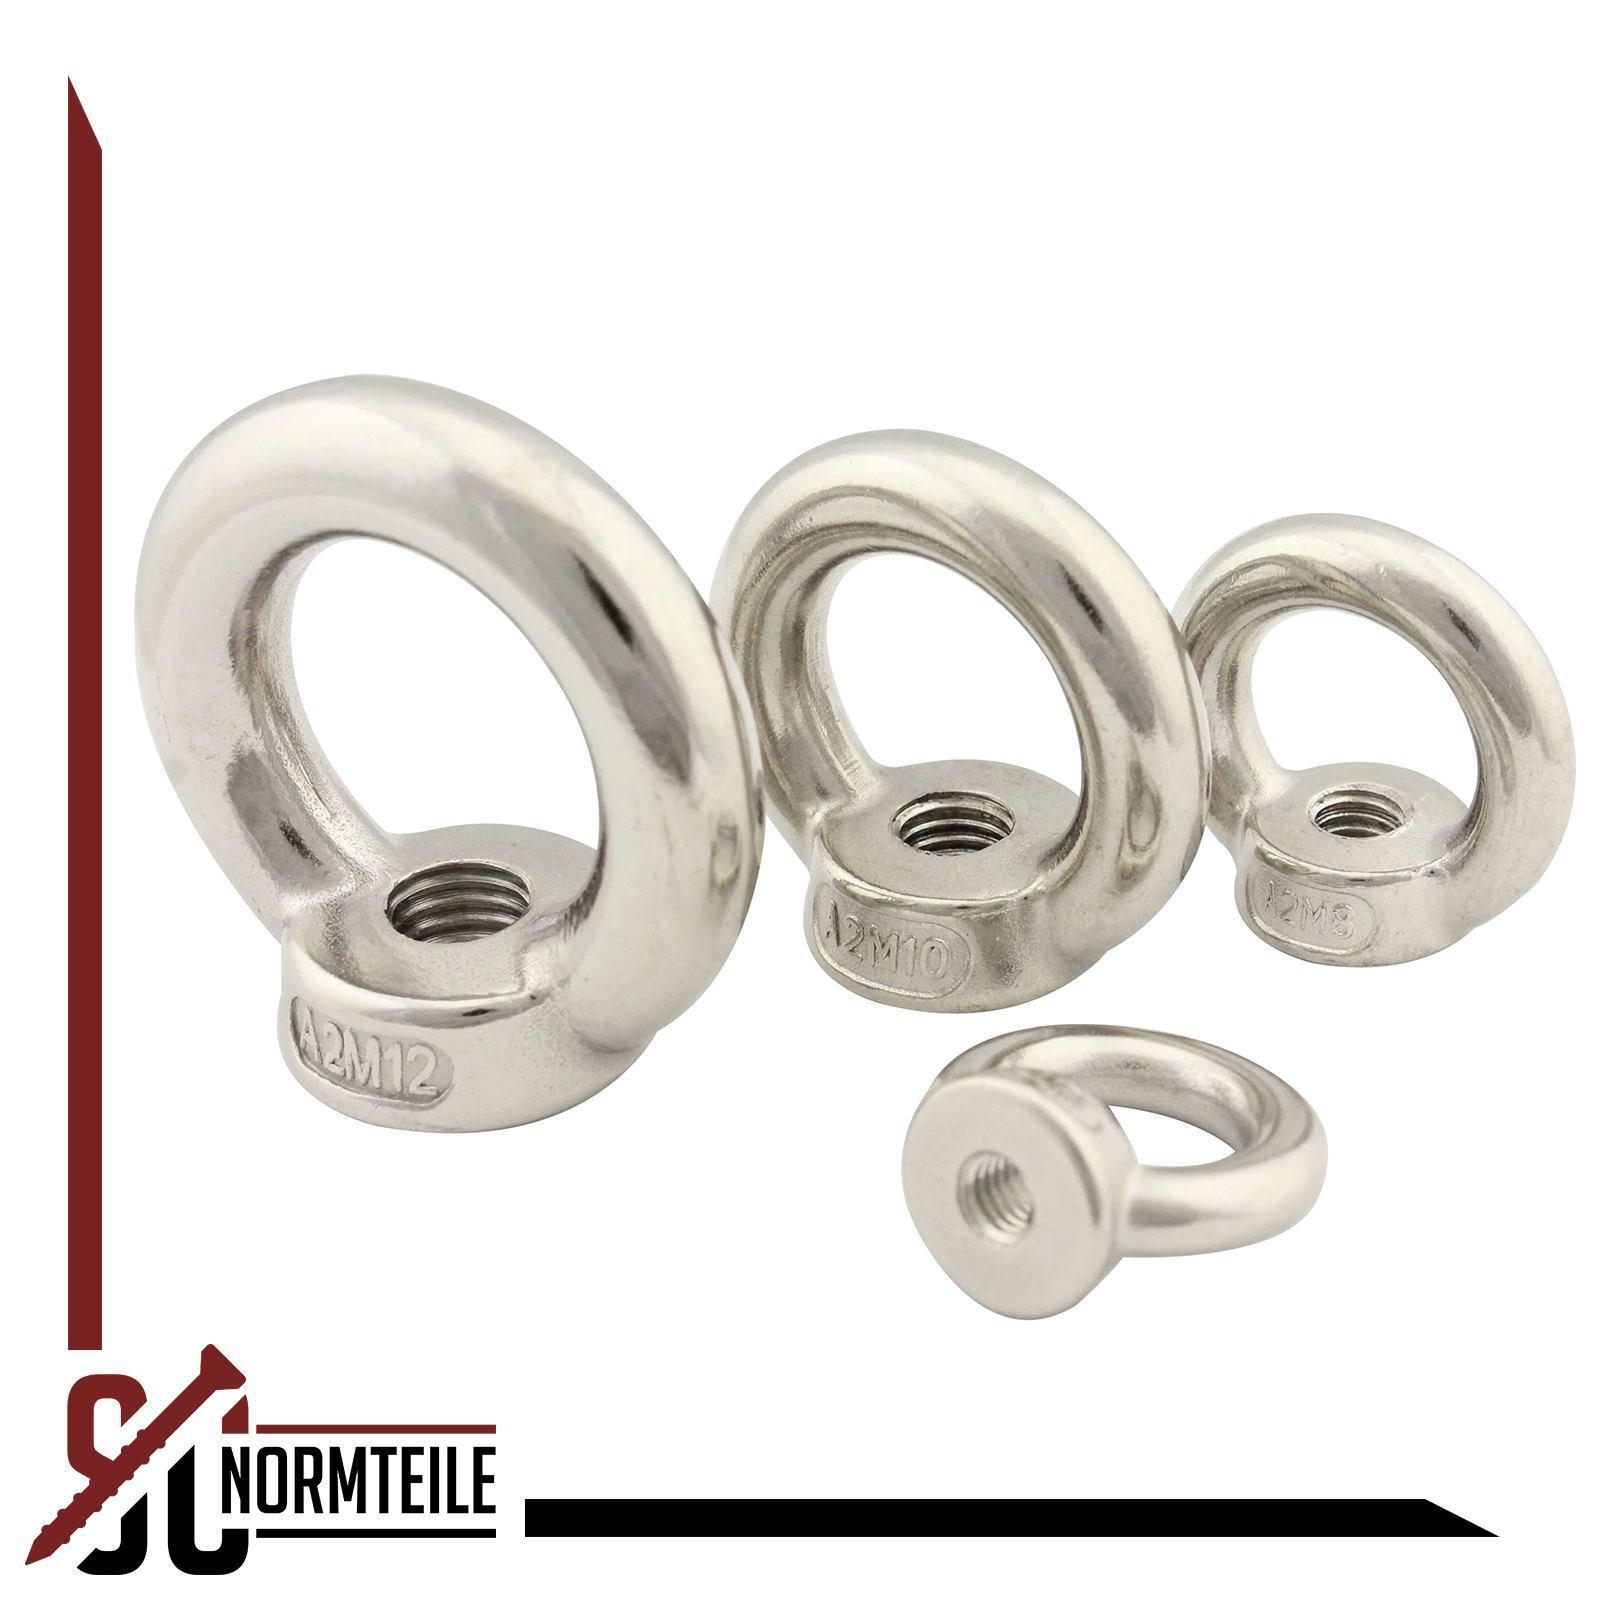 Eisenwaren2000 M10 /Ösenmutter 5 St/ück DIN 582 gegossen und poliert Edelstahl A2 V2A - Ringmutter /ähnl rostfrei